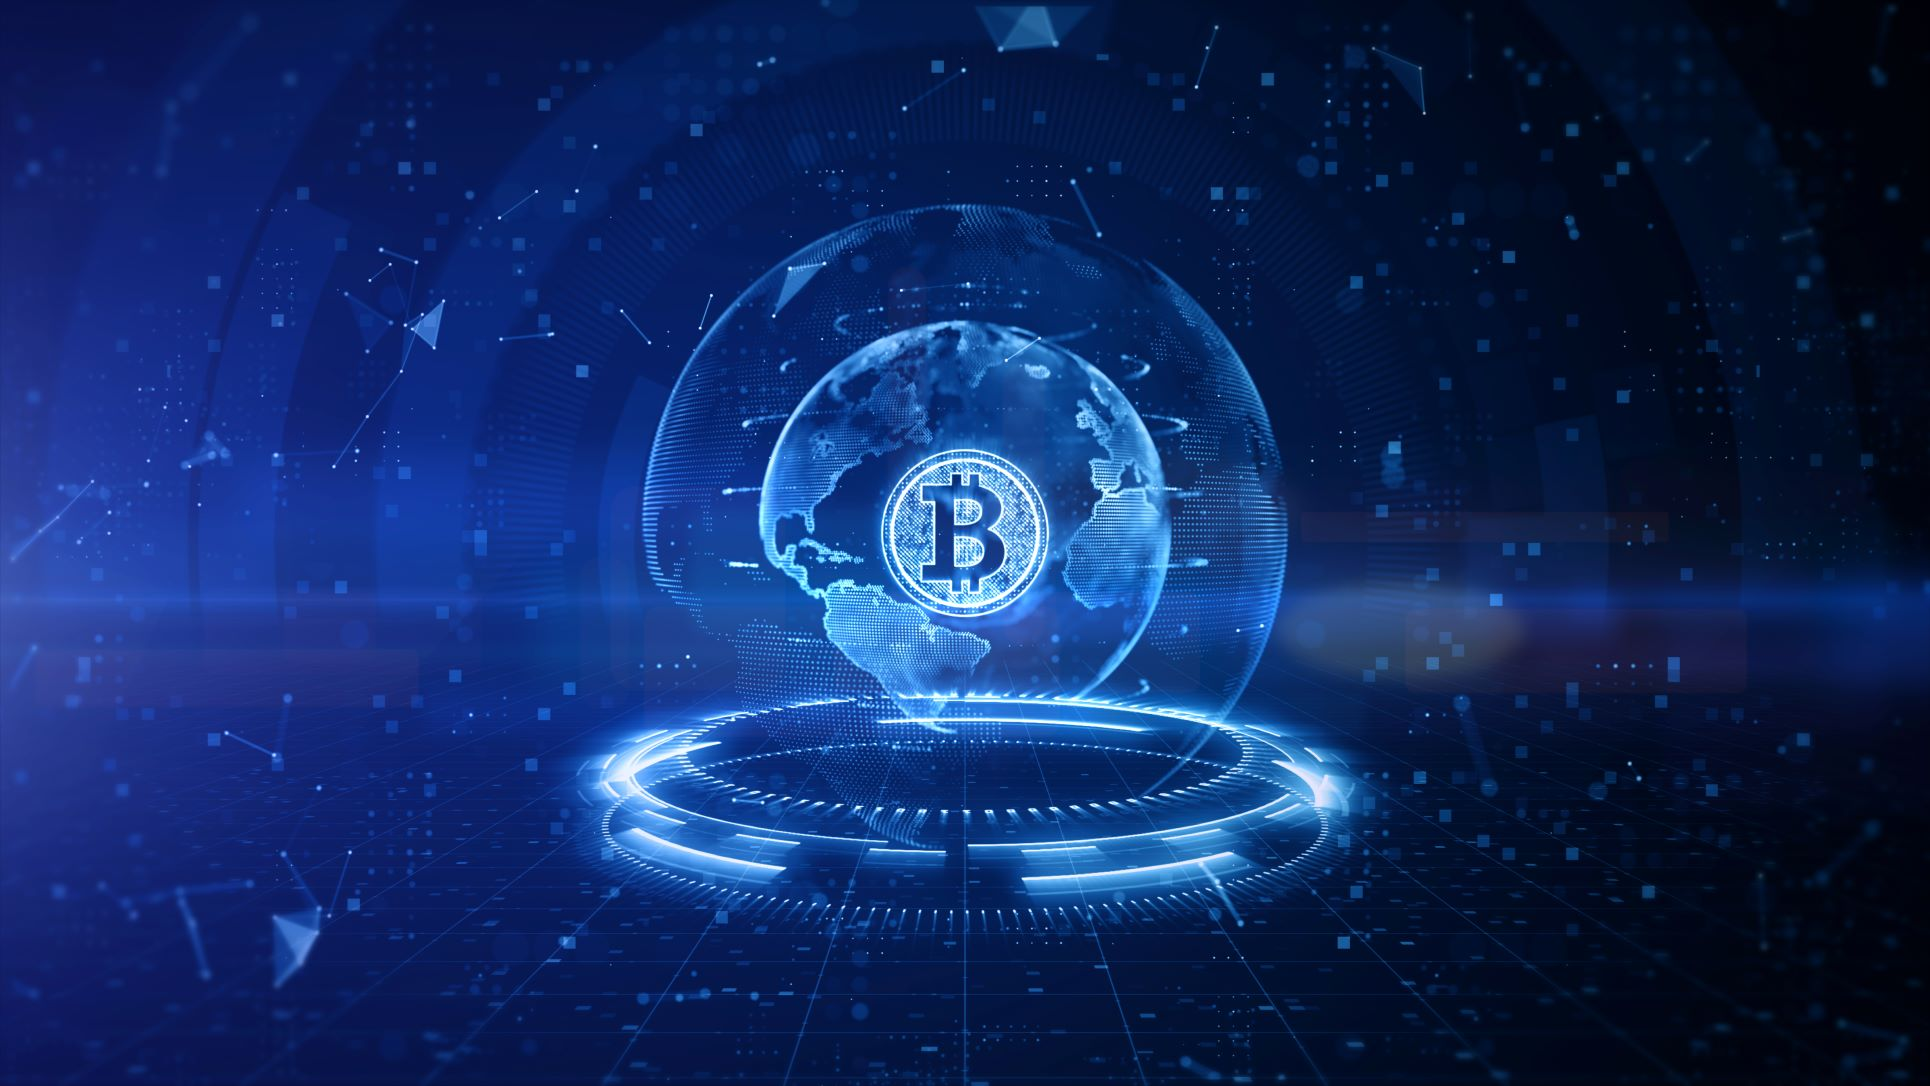 Bitcoin global news